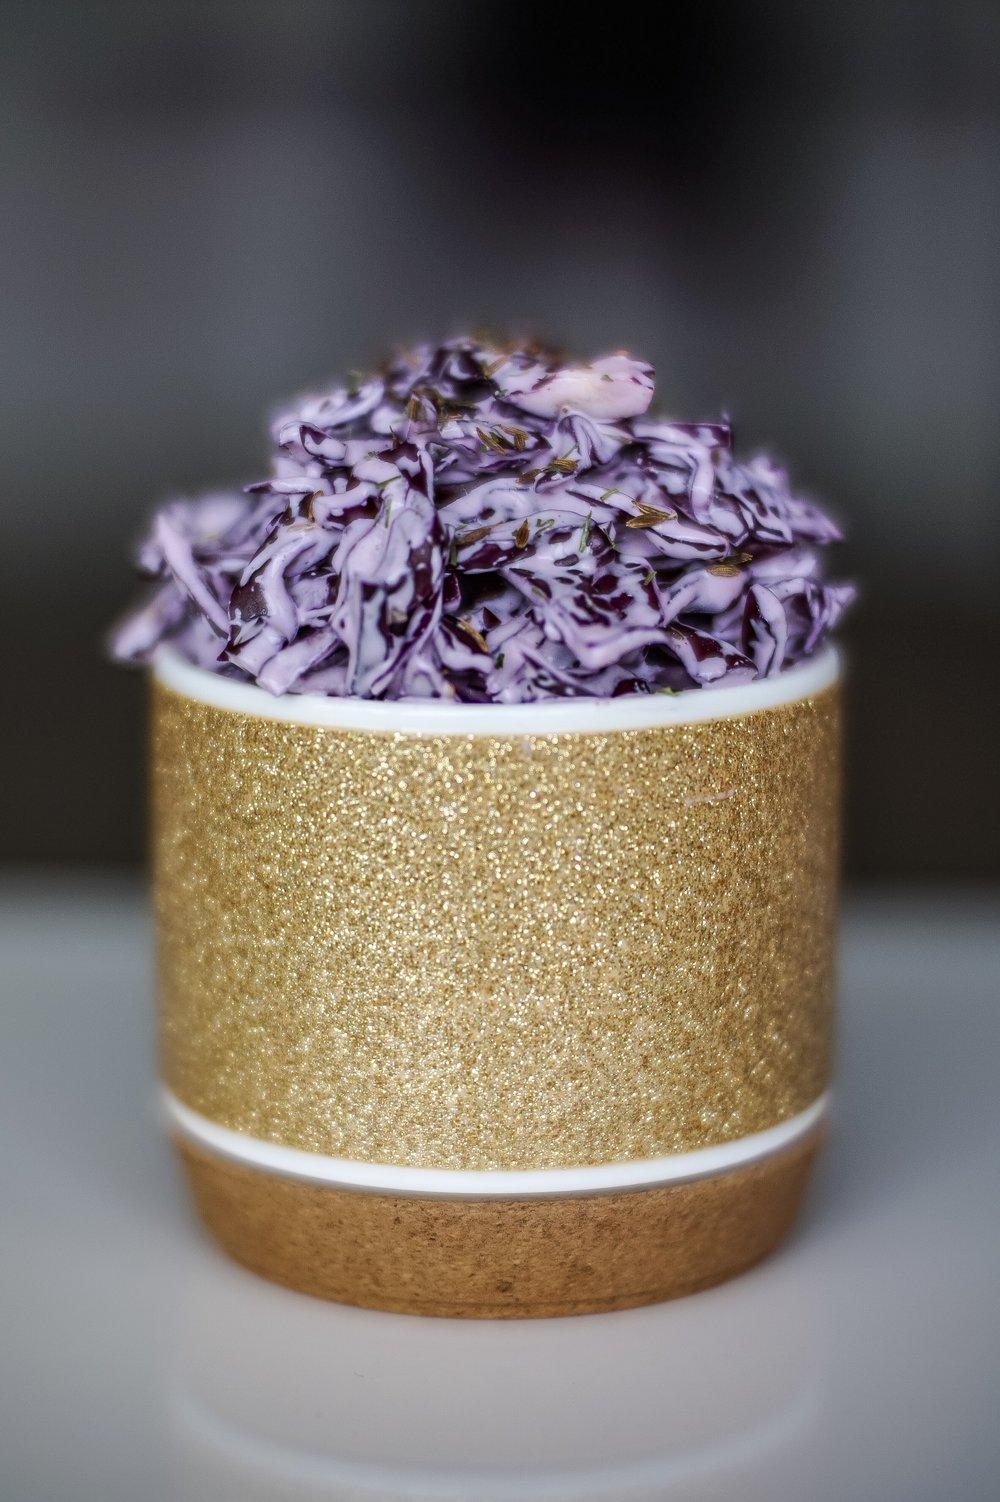 Coleslaw in a mug